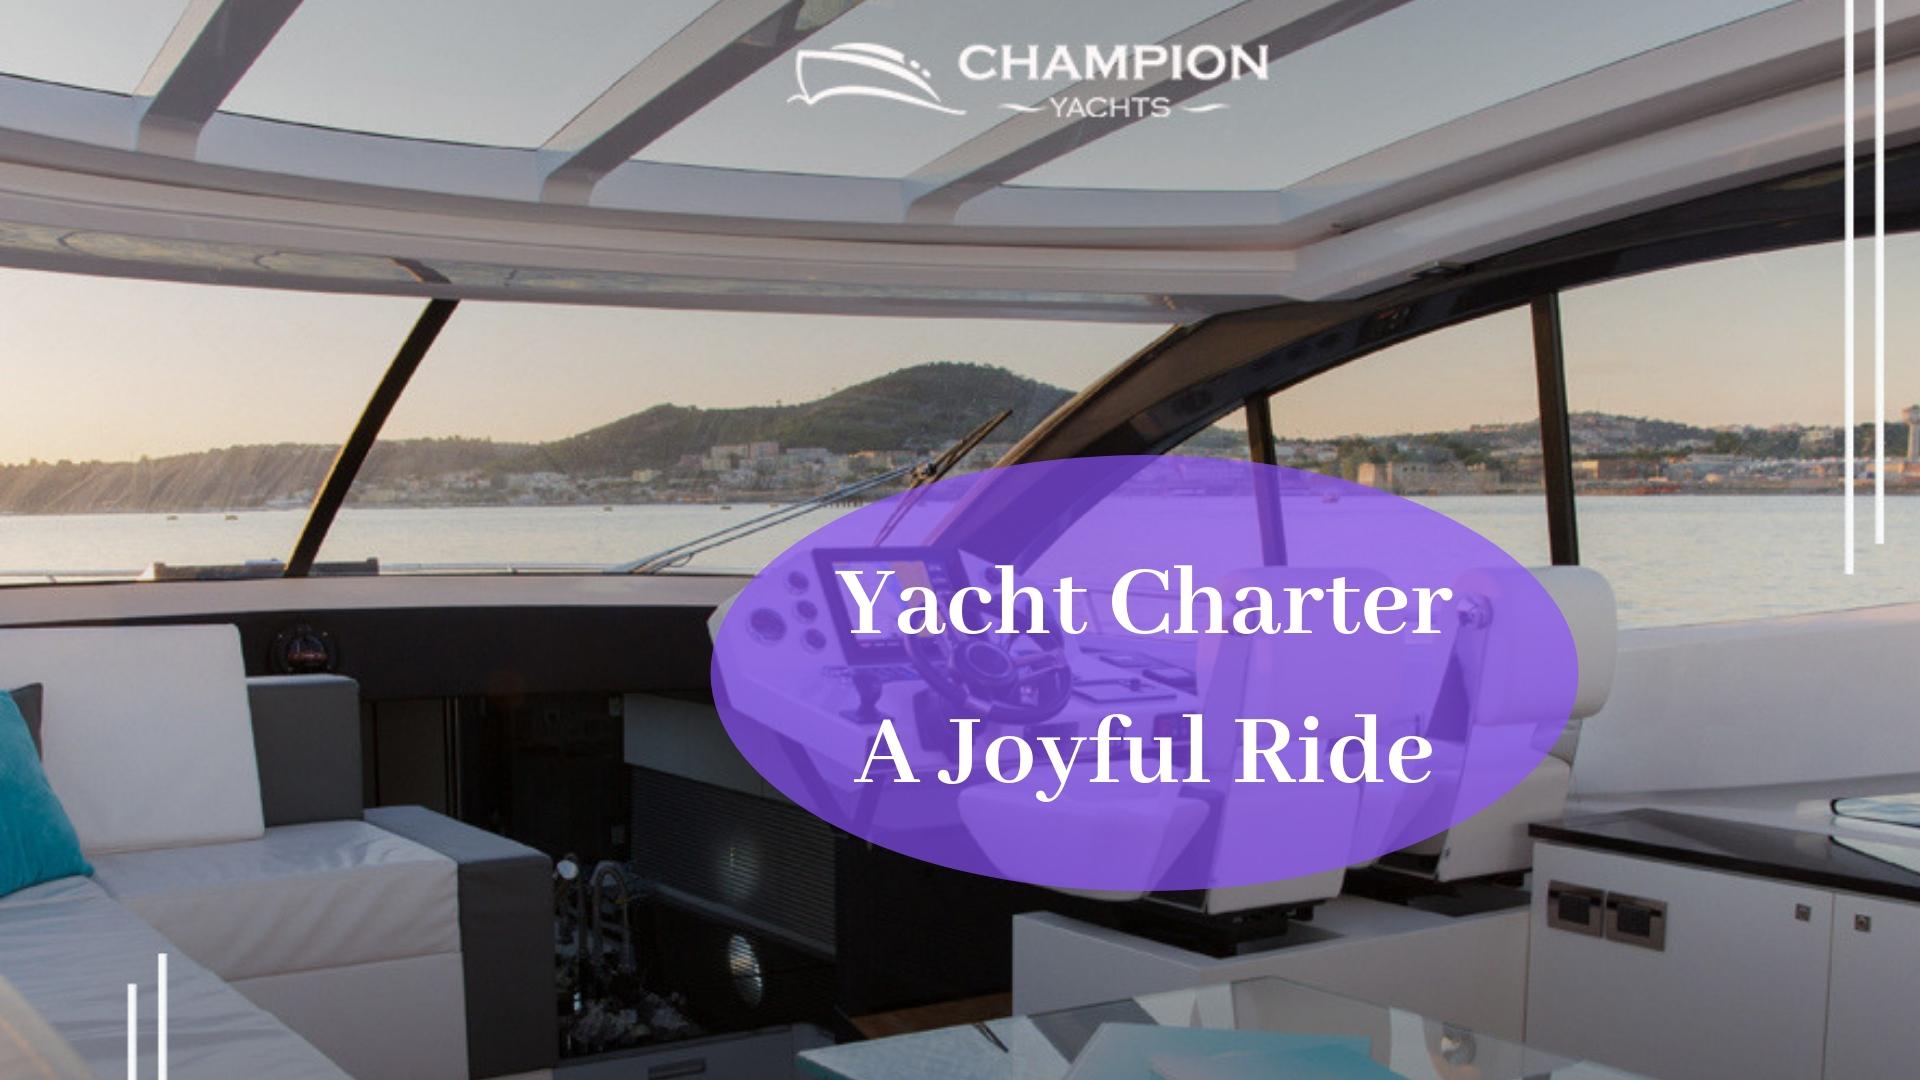 Yacht Charter: A Joyful Ride